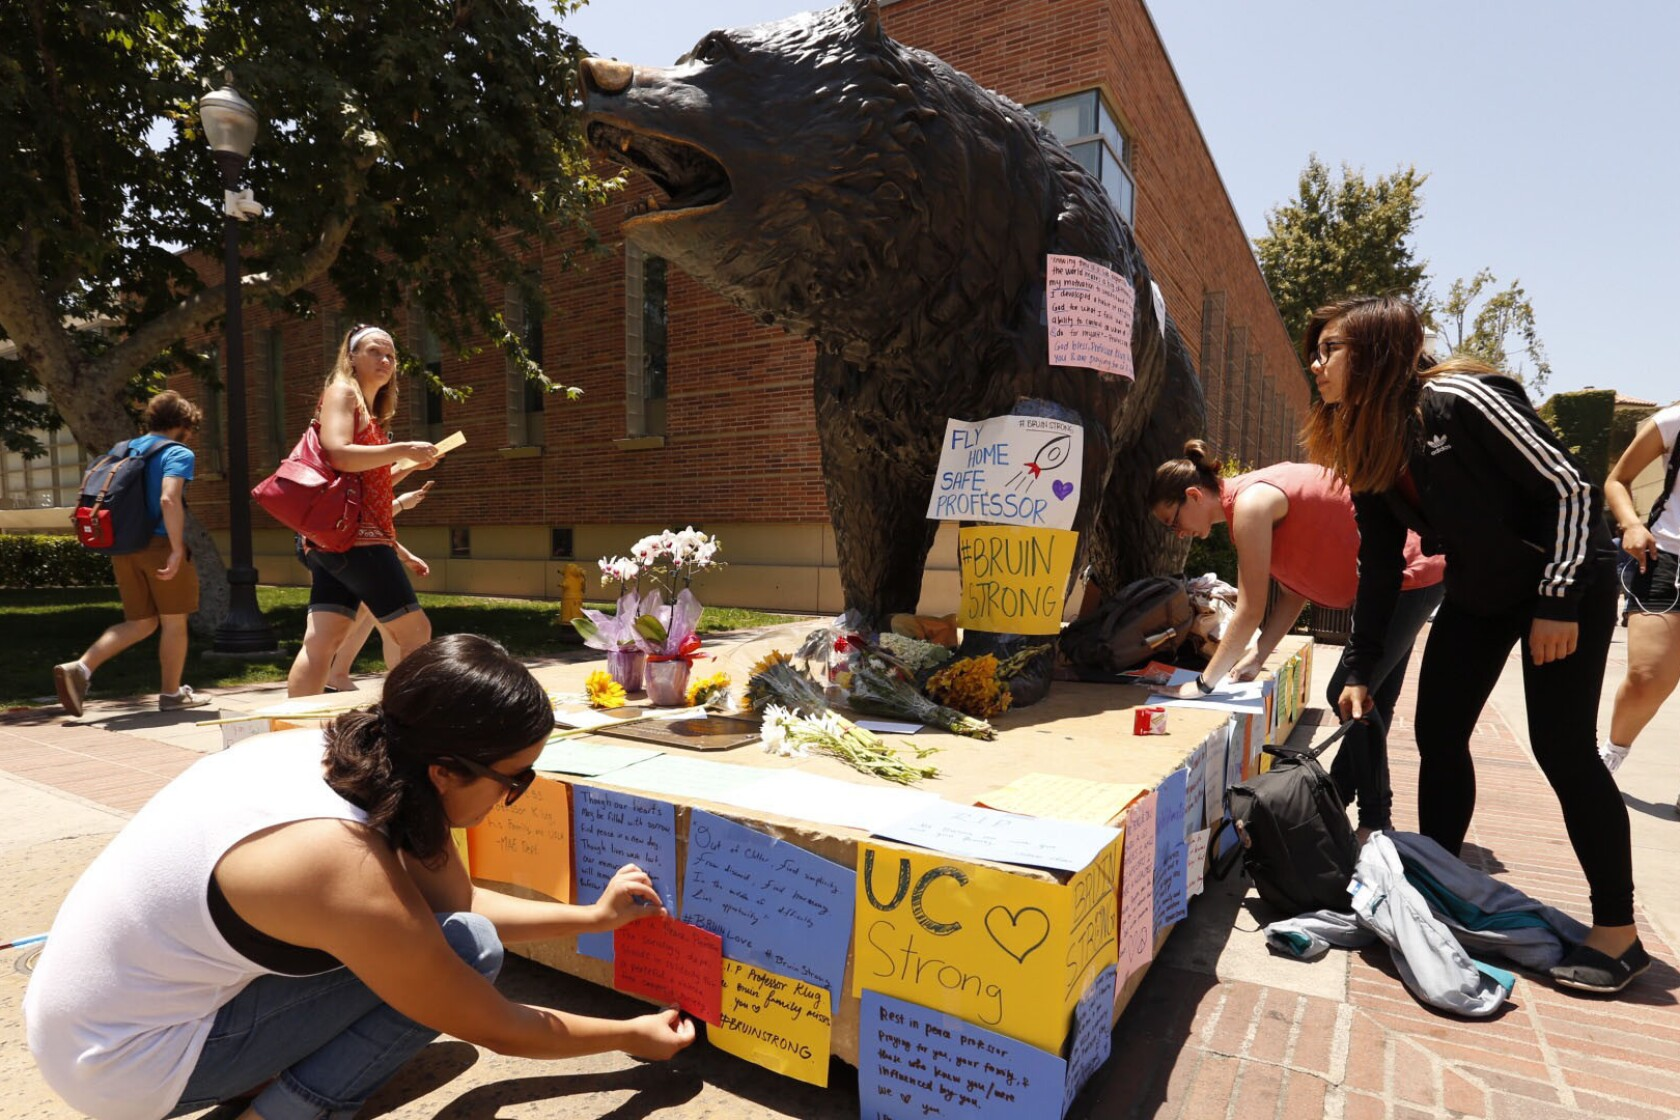 Professor killed in UCLA murder-suicide was brilliant, kind